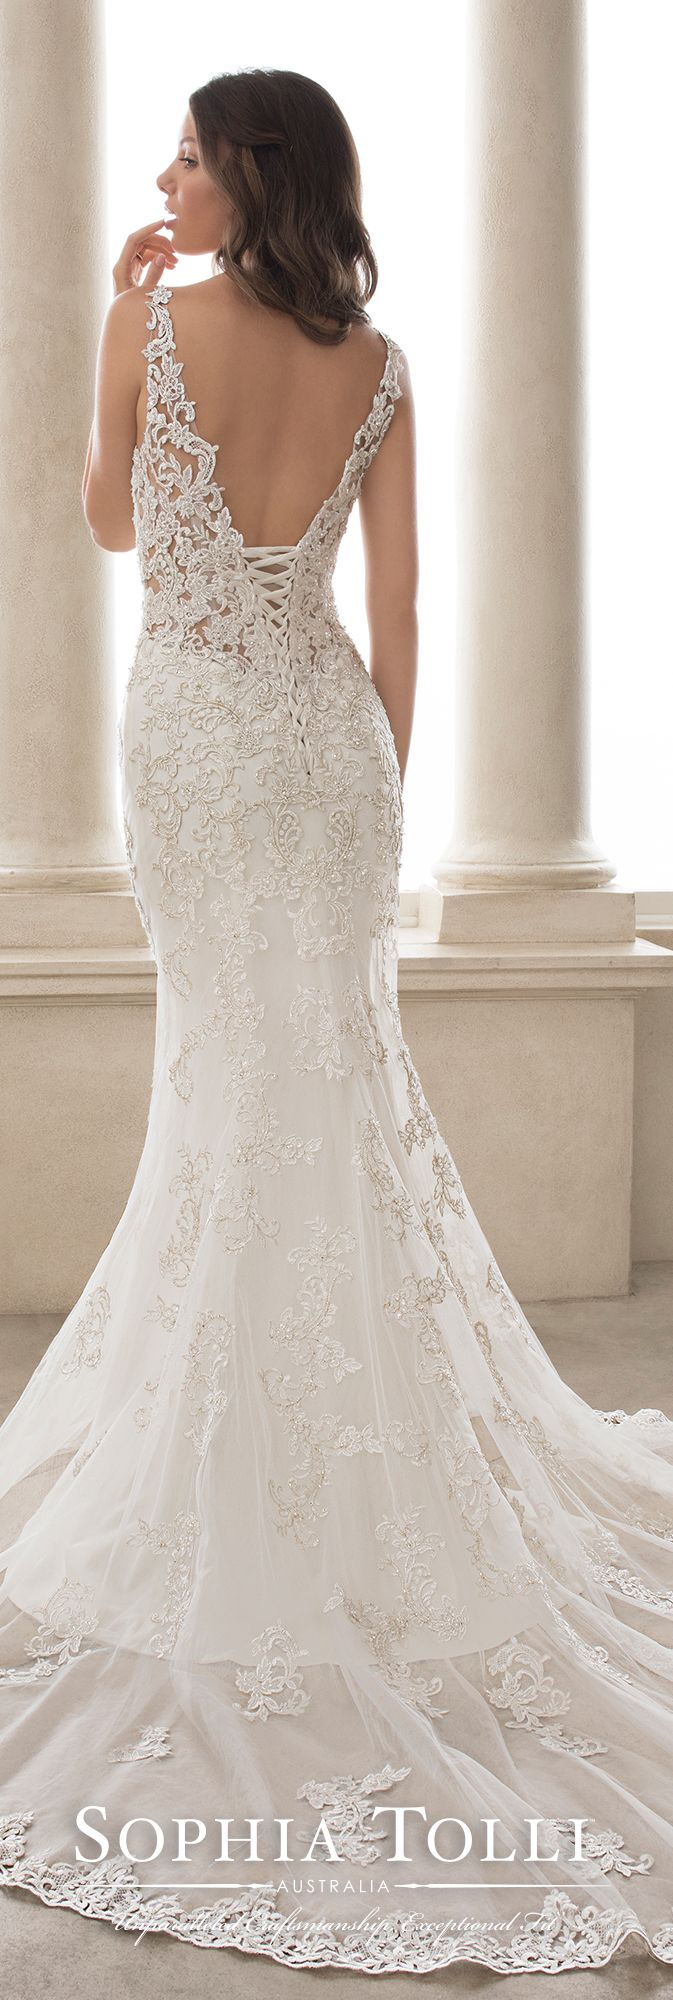 9a1fa7e471d Sophia Tolli Y21817 Turquoise. Sophia Tolli Y21817 Turquoise Wedding Dresses  ...